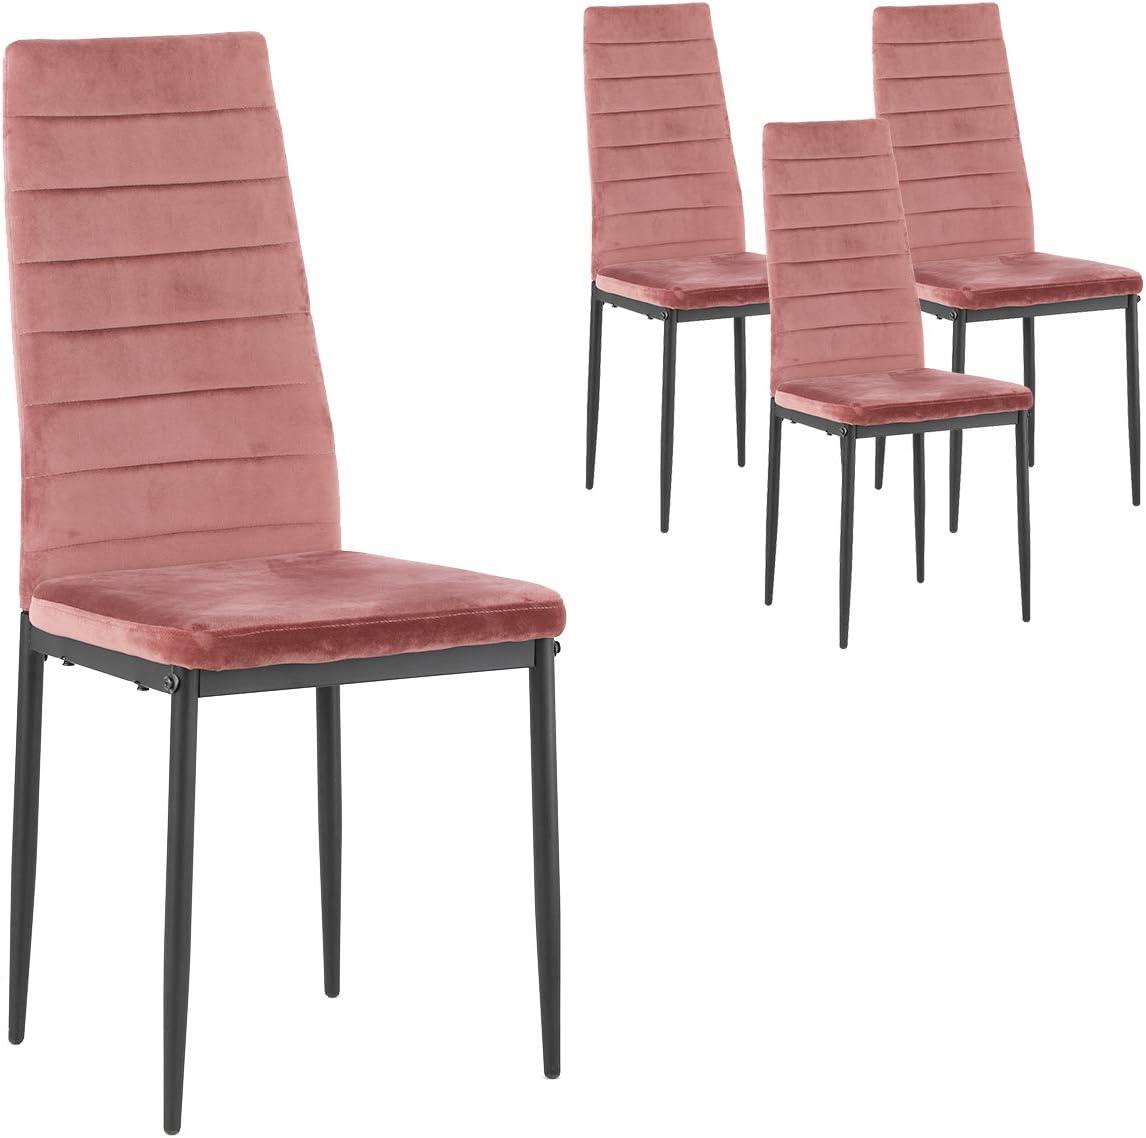 Aingoo Dining Chairs Velvet Seat and Ergonomic High Back Kitchen